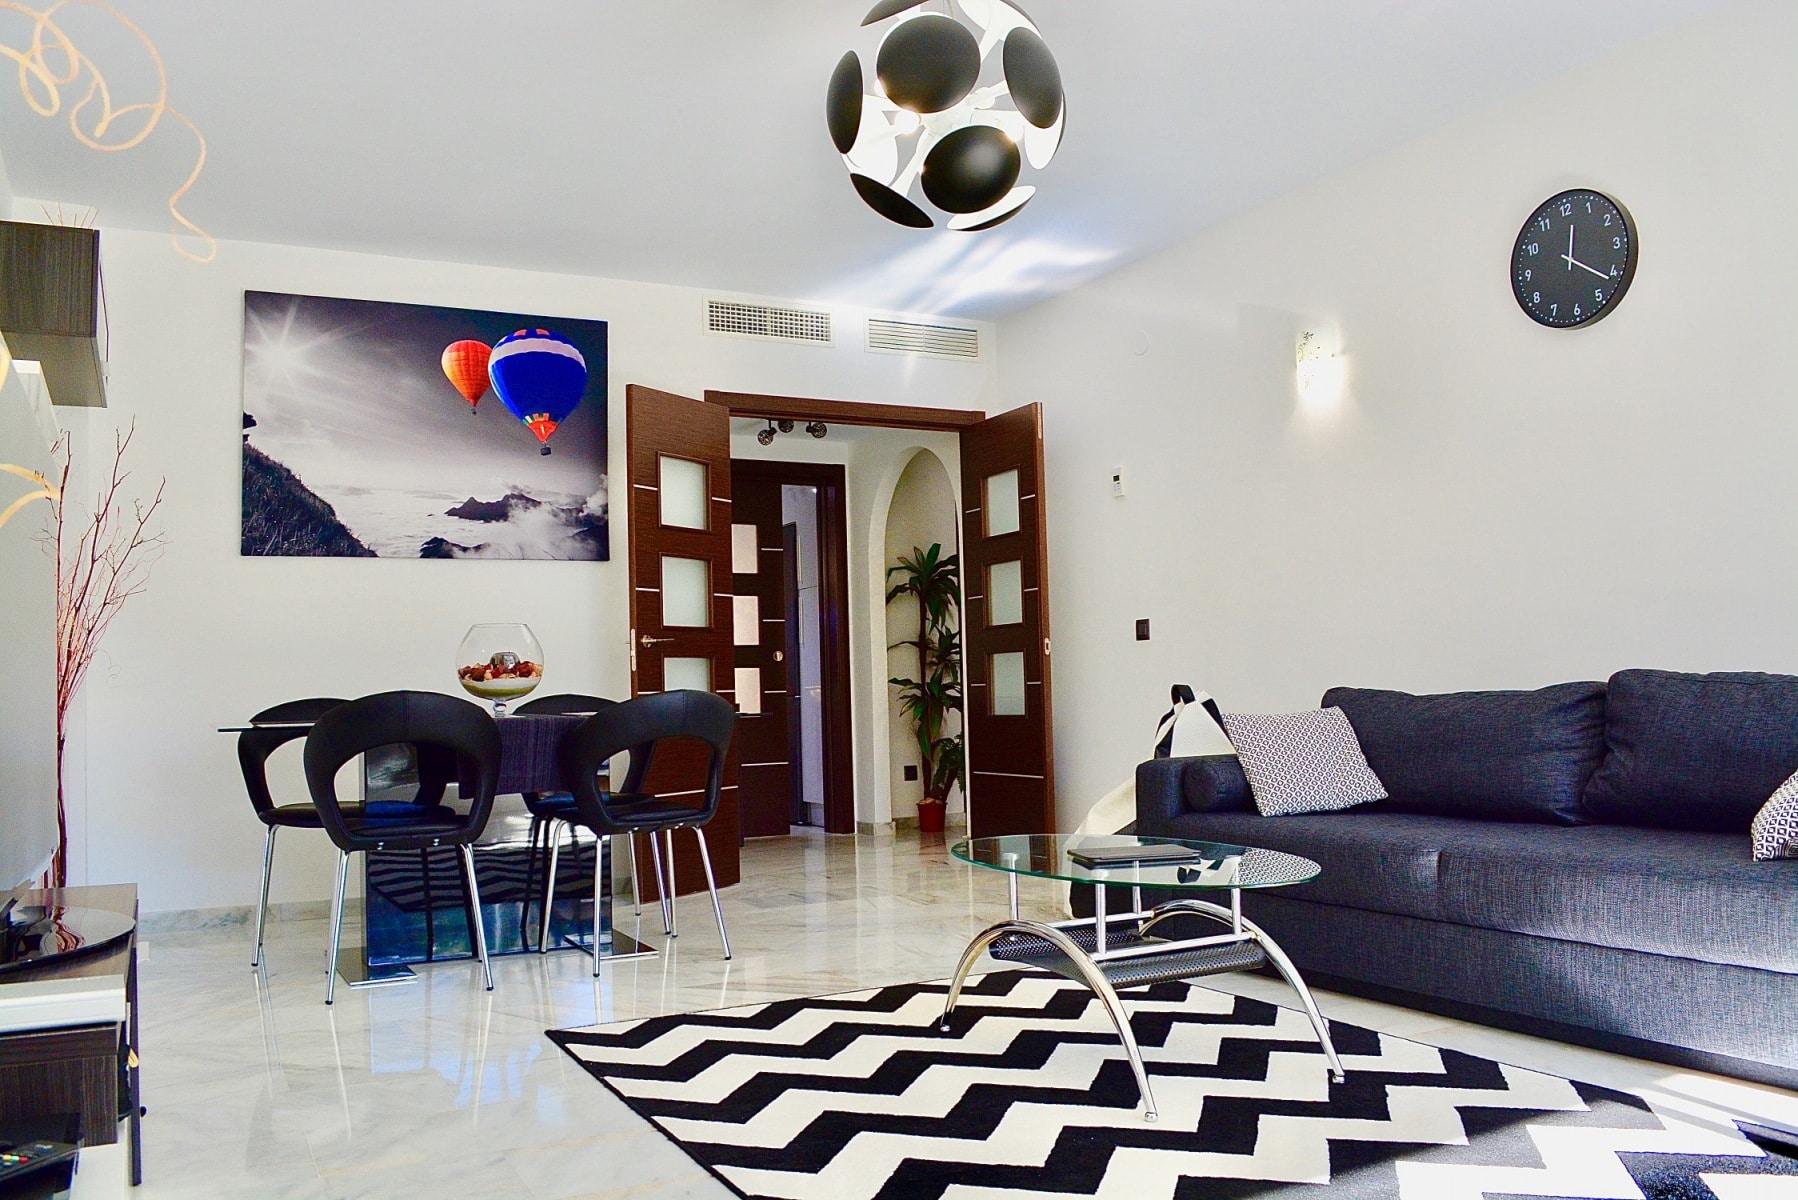 Living room renovation, new wooden floors